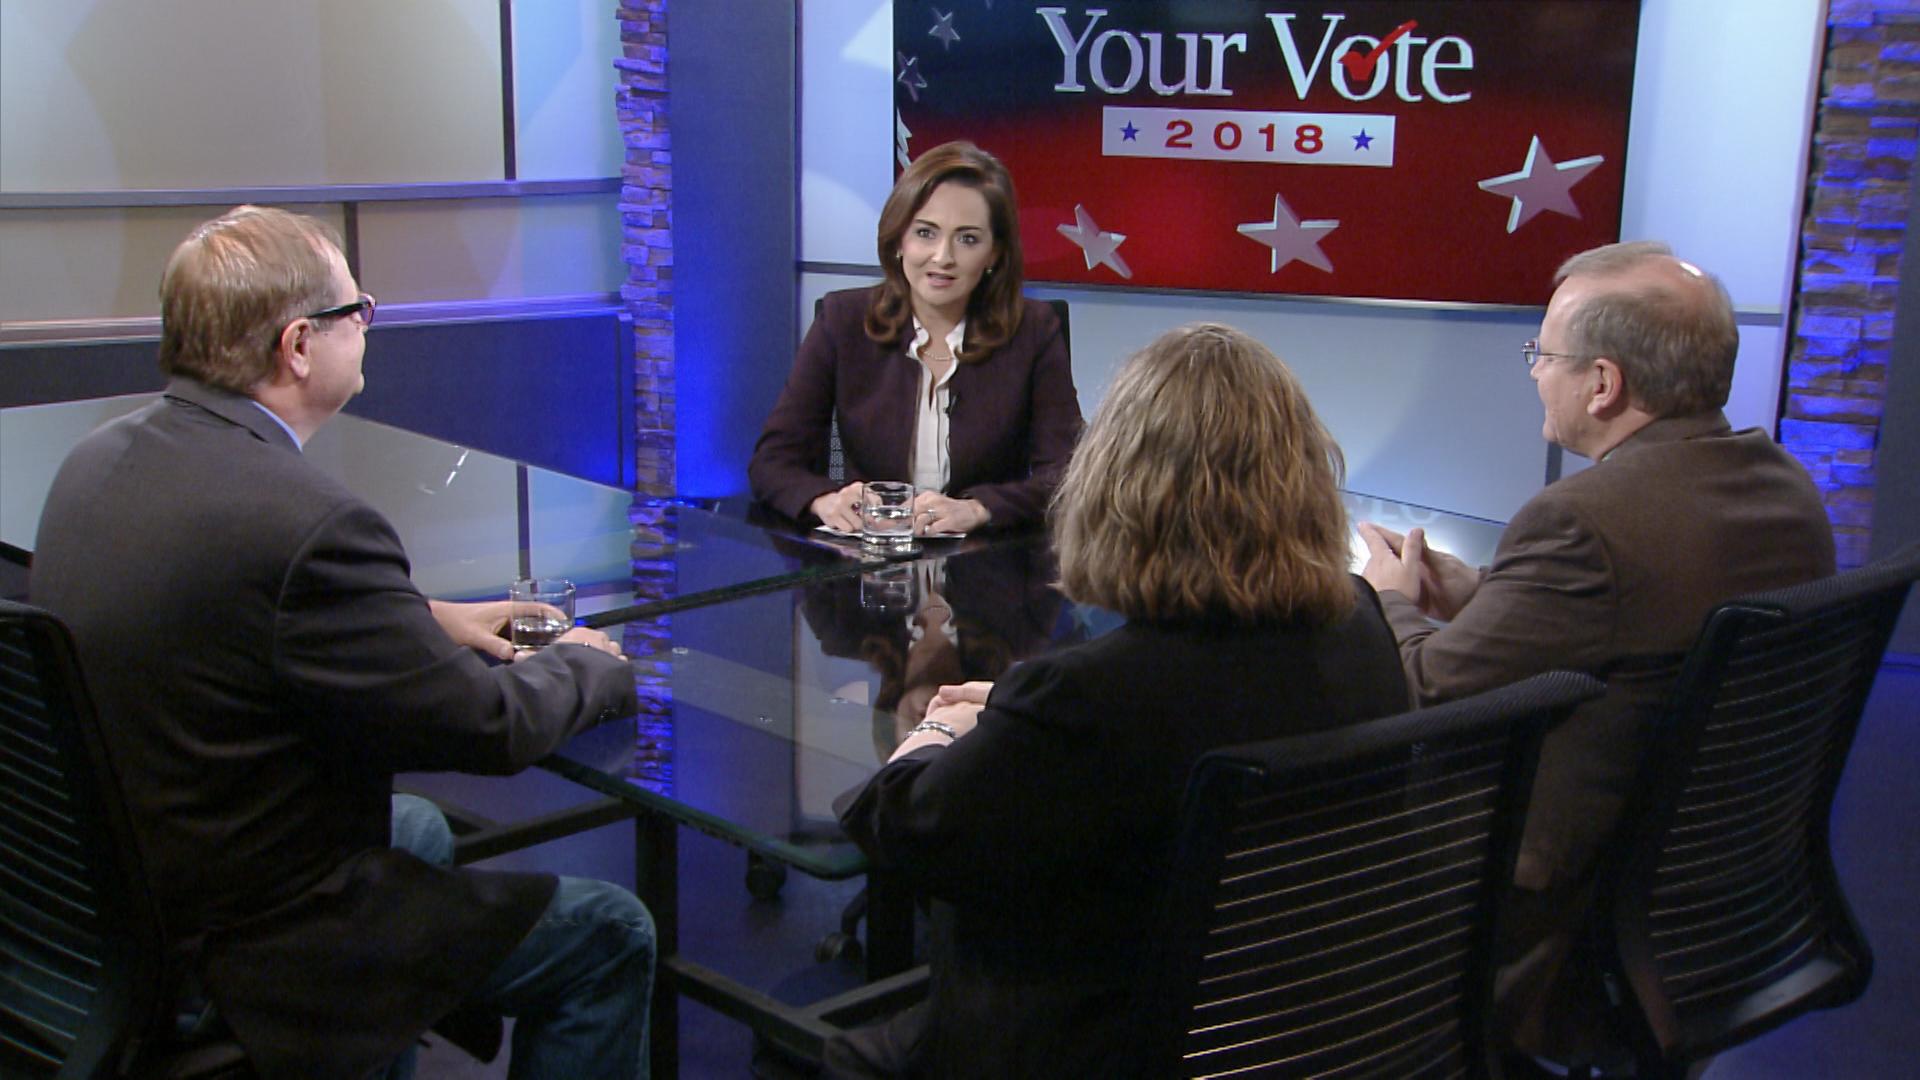 Sarah Garrecht Gassen from Arizona Daily Star. Dan Shearer from Green Valley News. Jim Nintzel from Tucson Local Media.